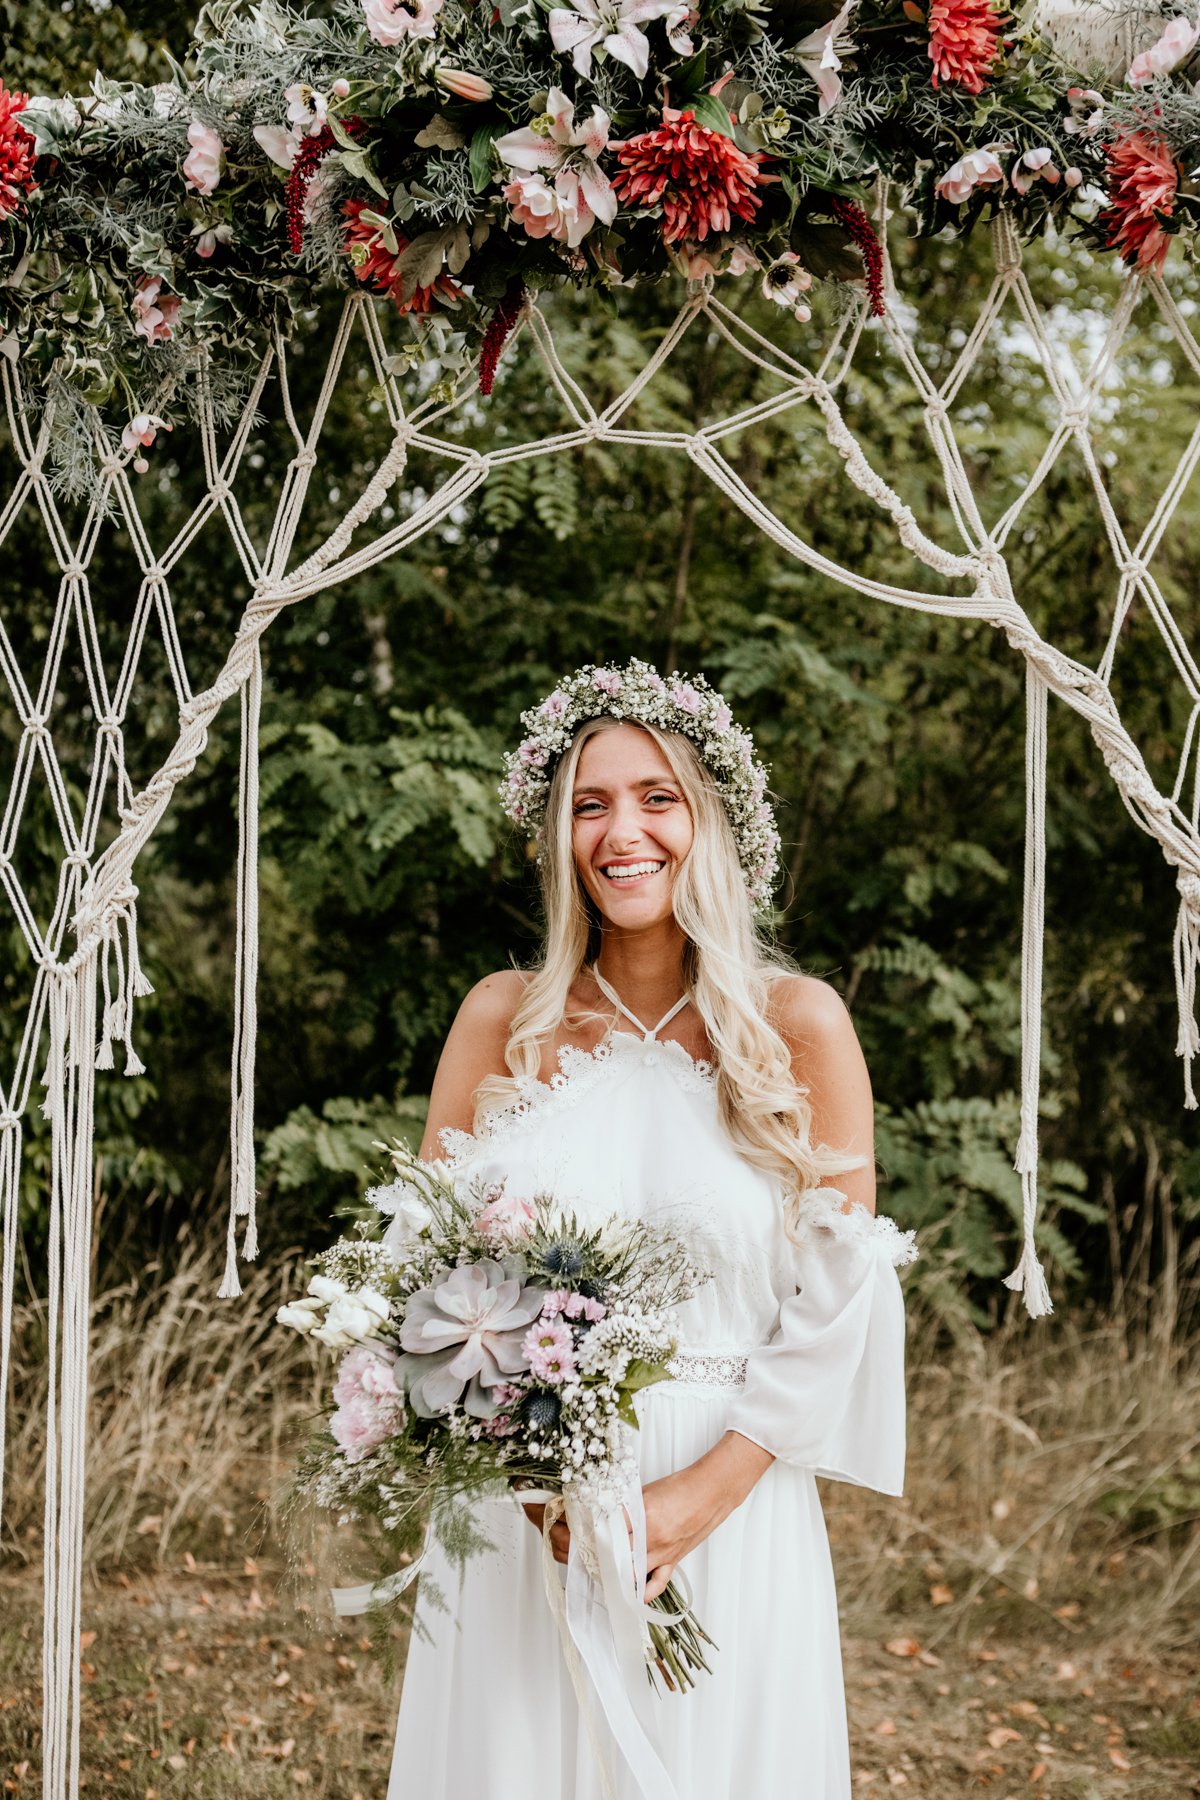 Styled Wedding 1 beeld.schoon-selinderella klein formaat-28